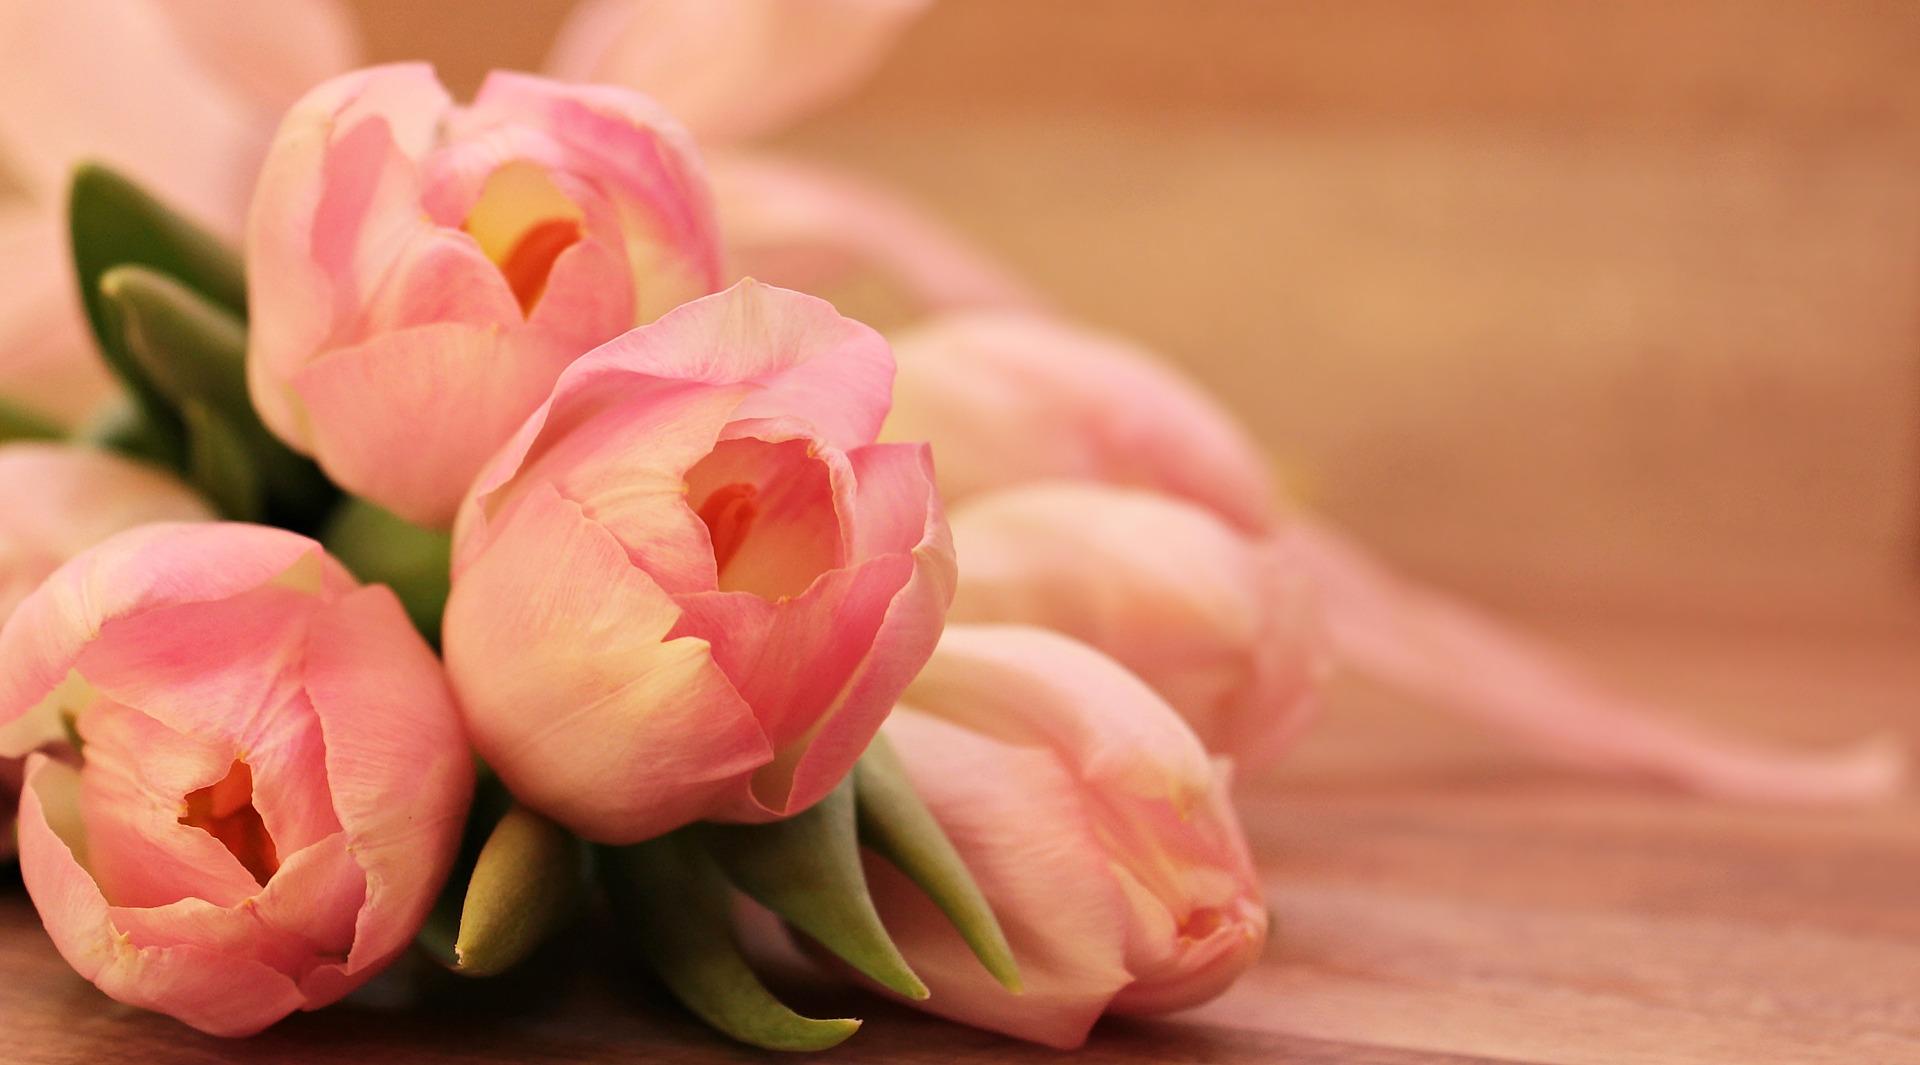 tulips-2068692_1920-7yy7s